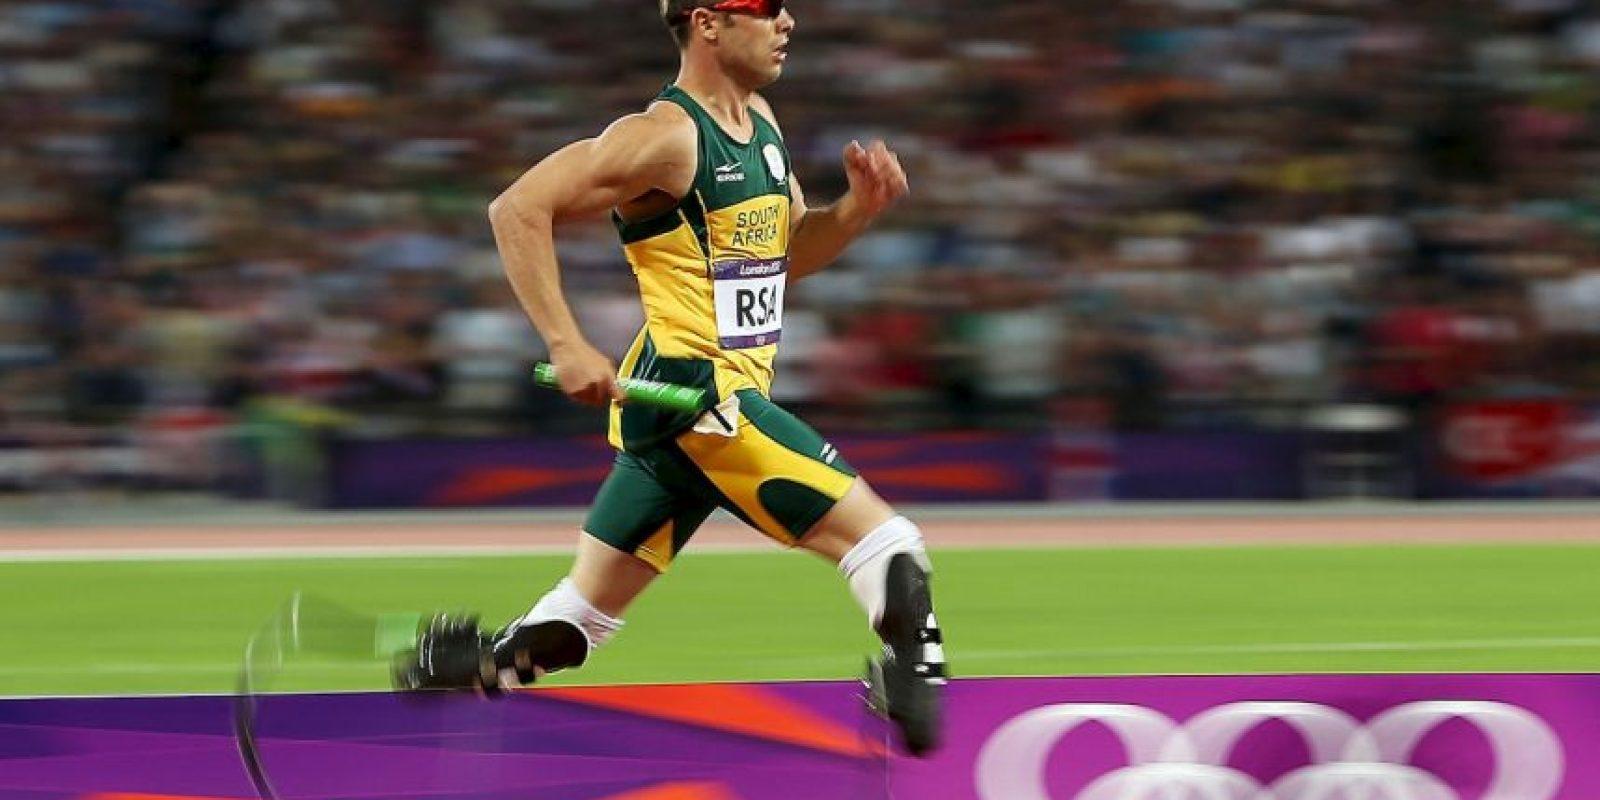 7. Oscar Pistorius Foto:Getty Images